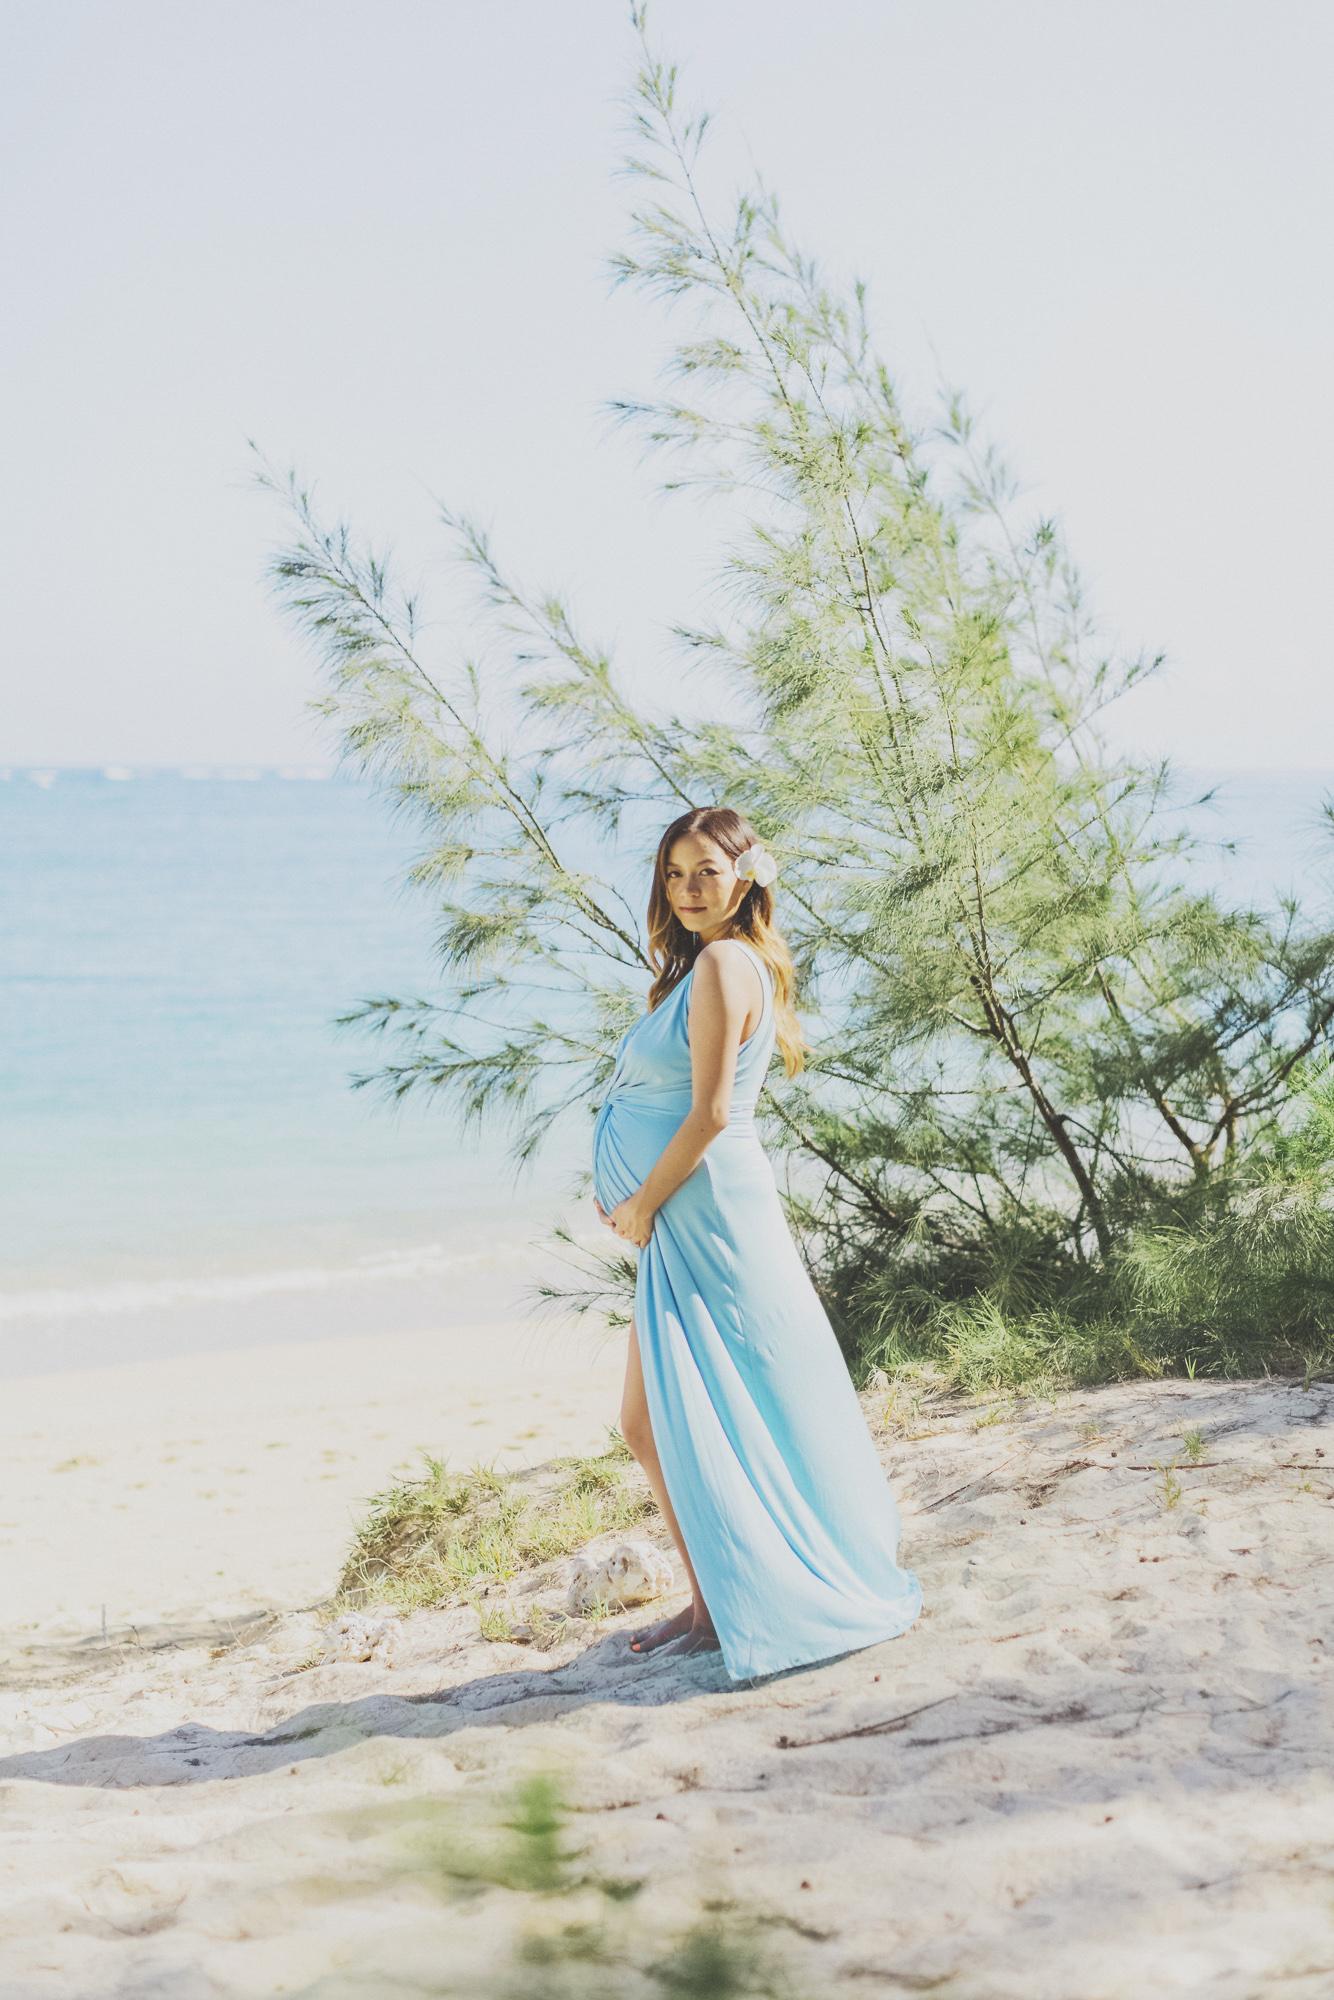 AngieDiaz_Photography050Smaller.JPG